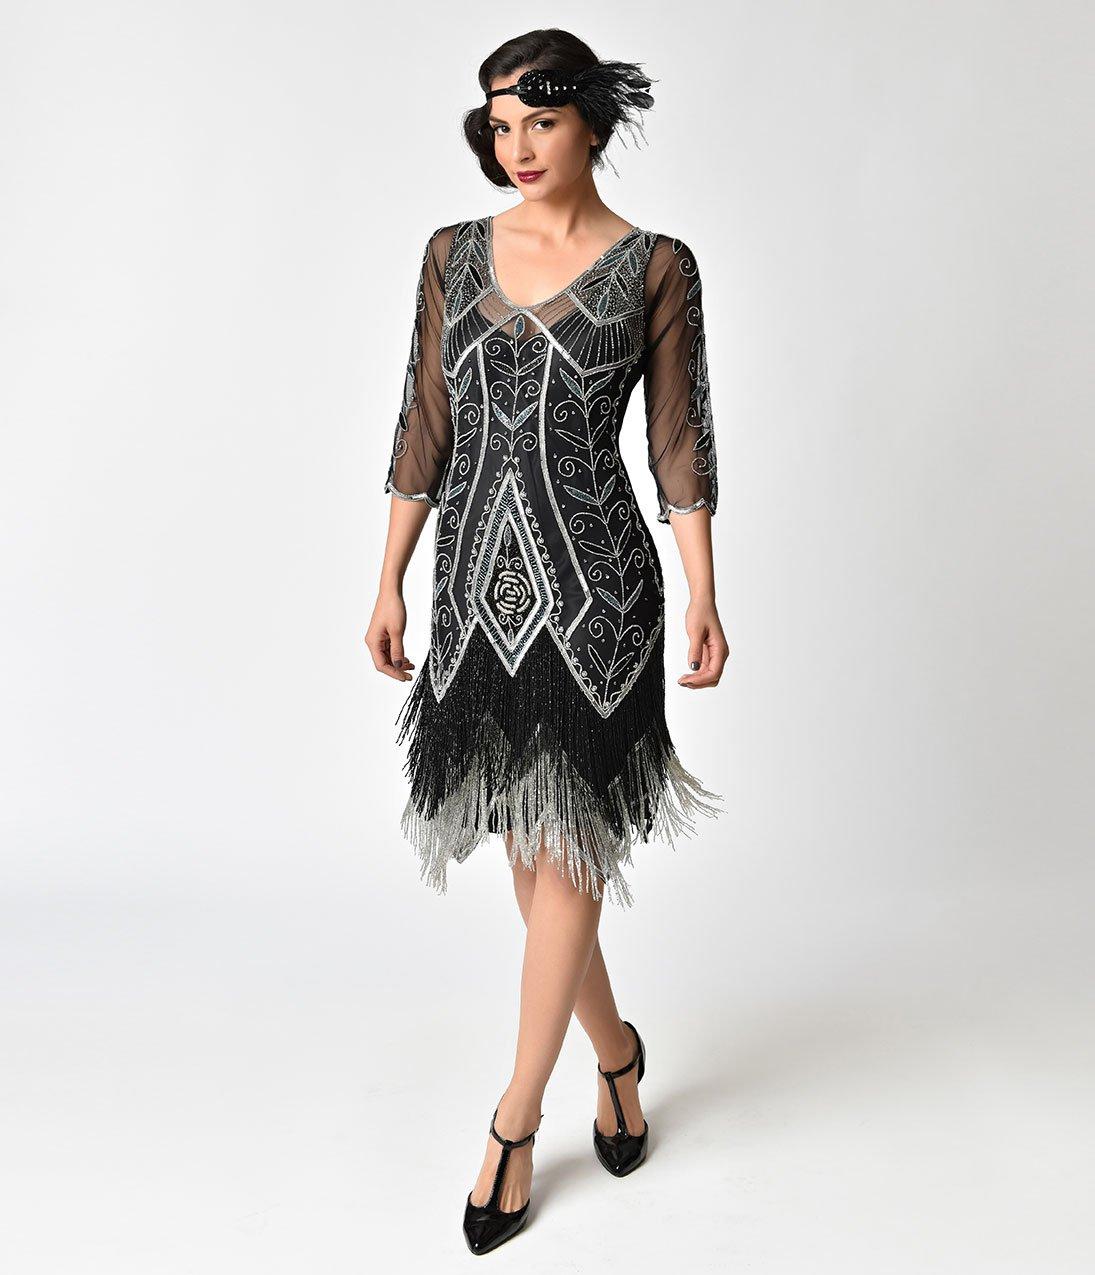 Cheap Wedding Dresses Madison Wi: 1920s Style Black & Silver Beaded Sleeved Scarlet Fringe